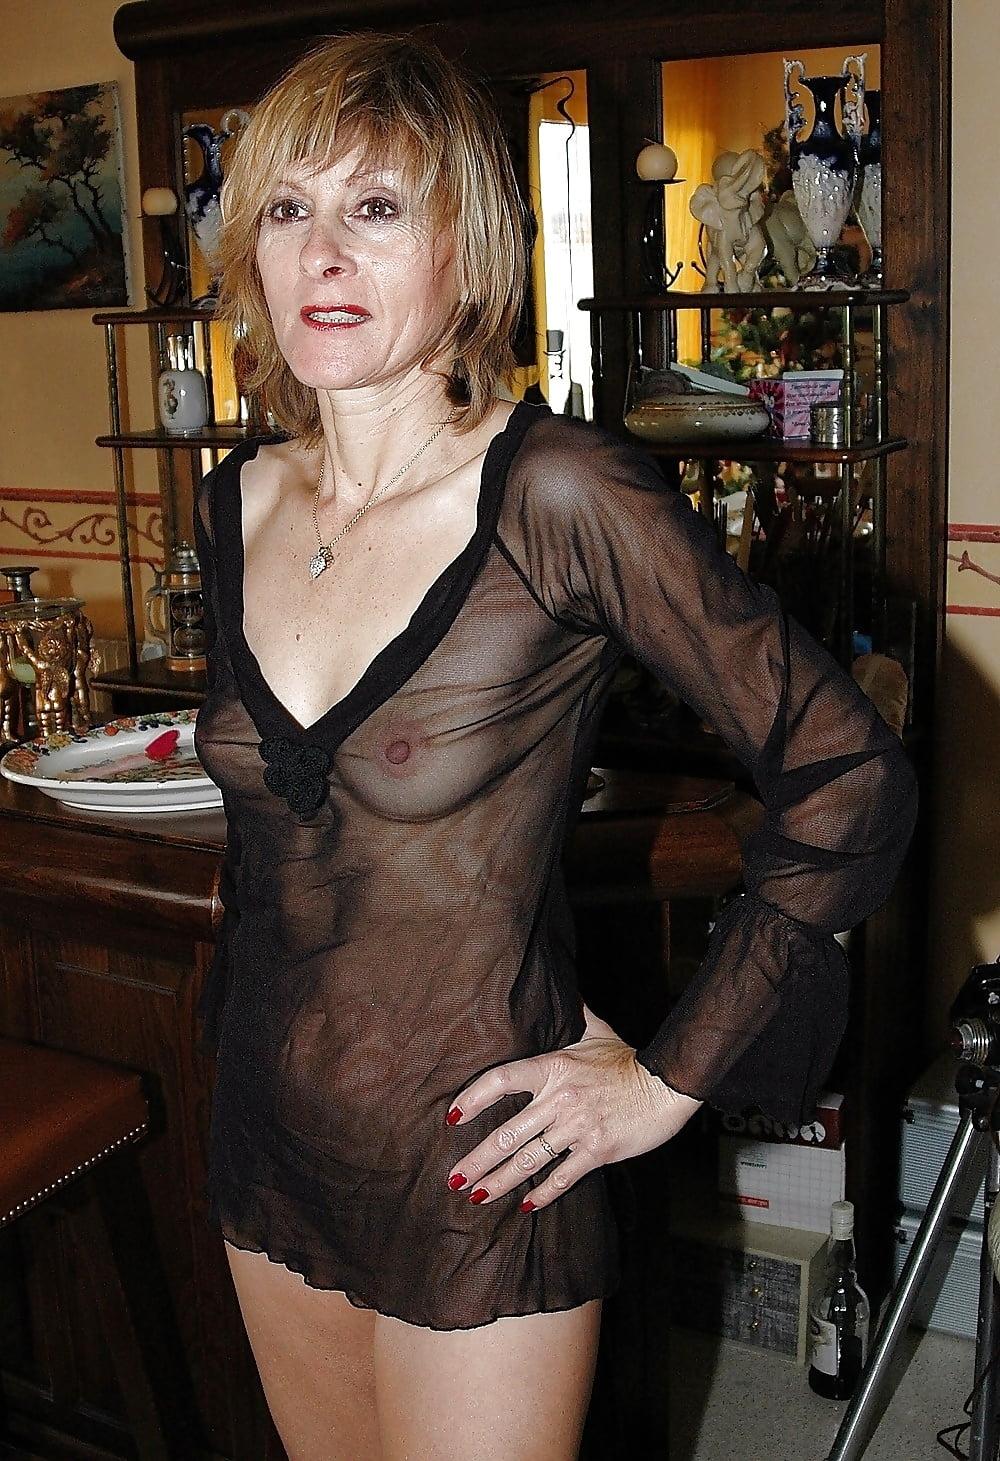 milf-see-through-black-dress